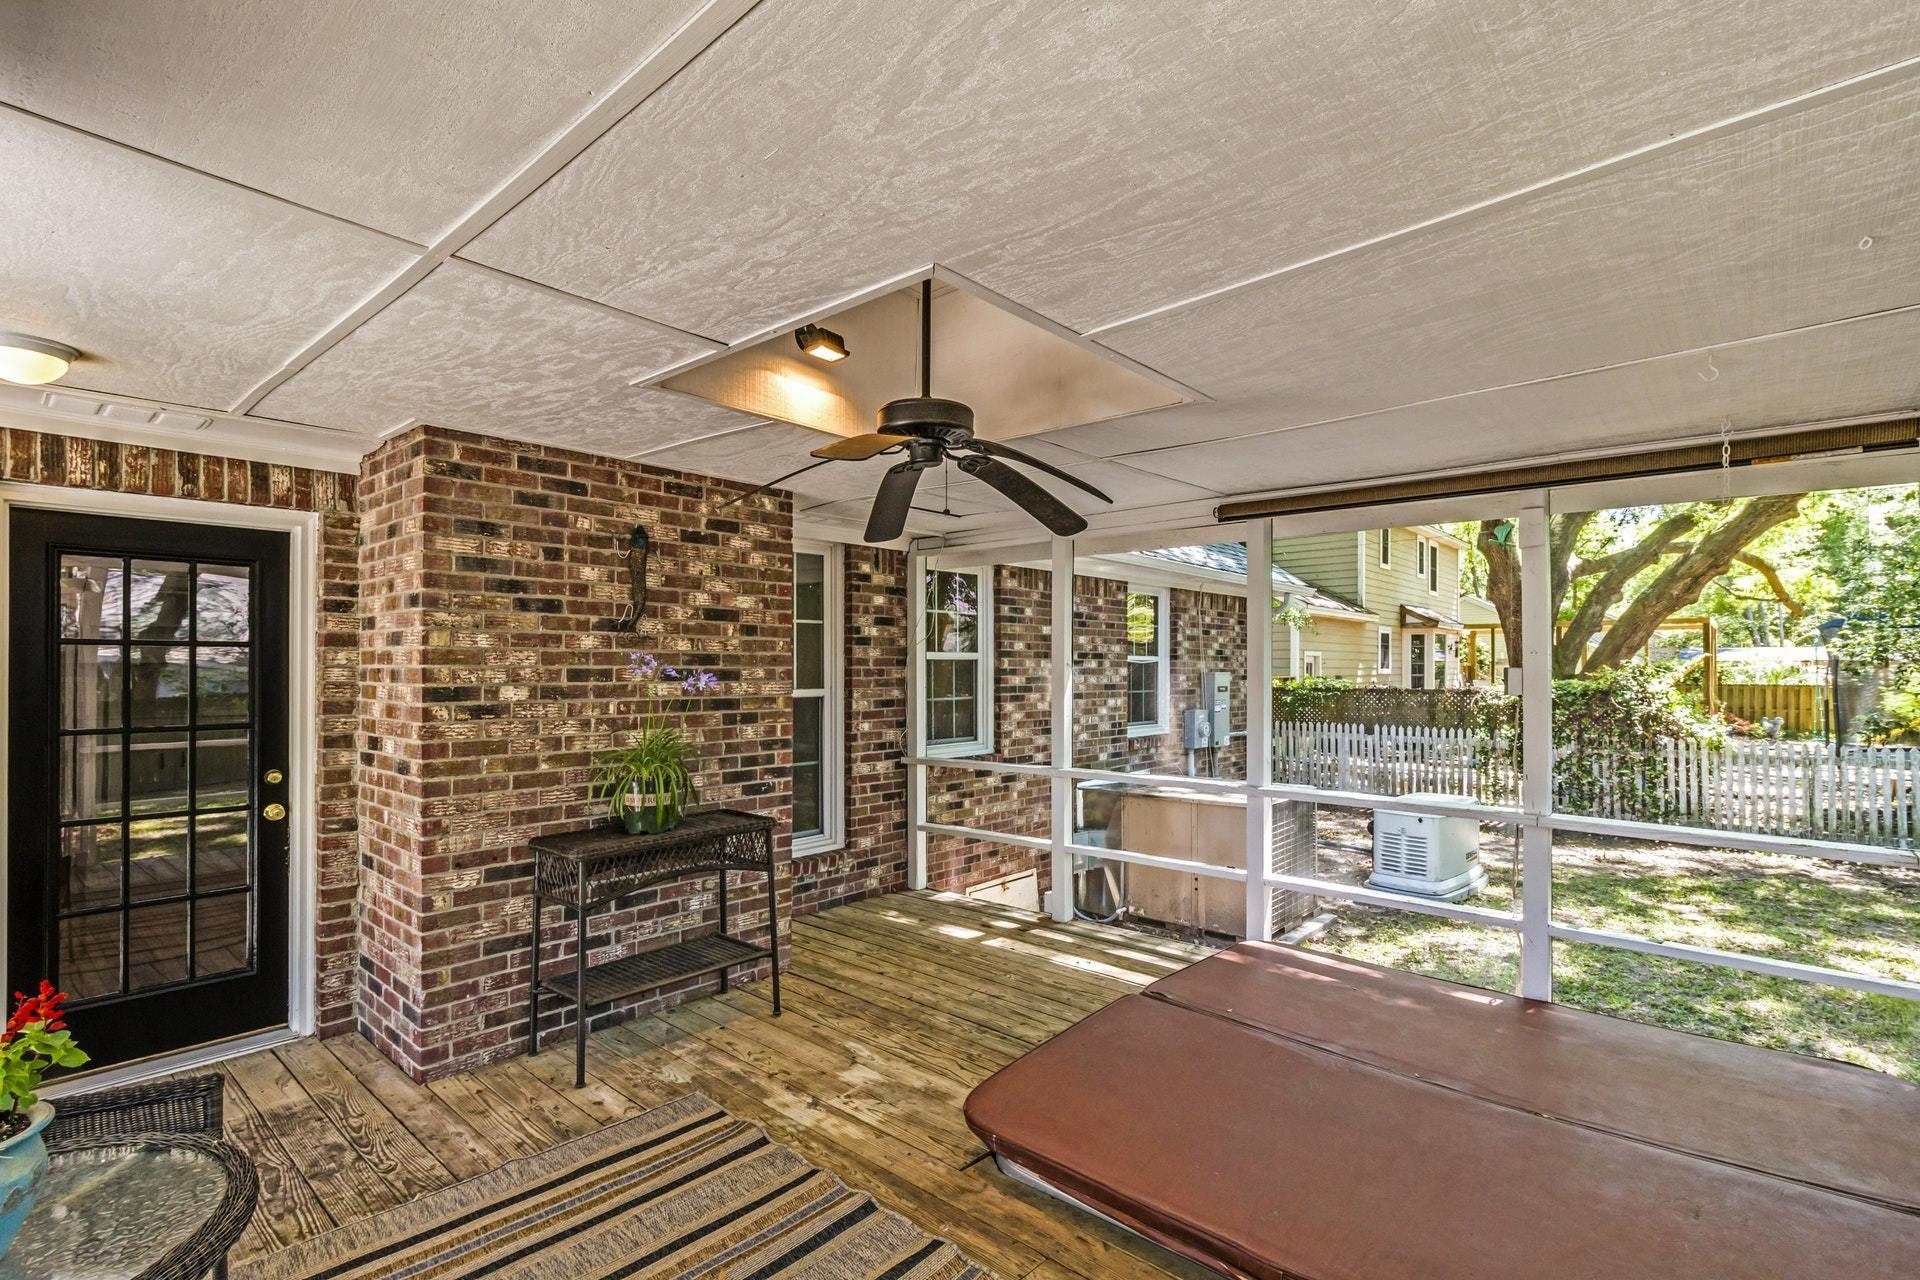 Shemwood II Homes For Sale - 969 Sea Gull, Mount Pleasant, SC - 2